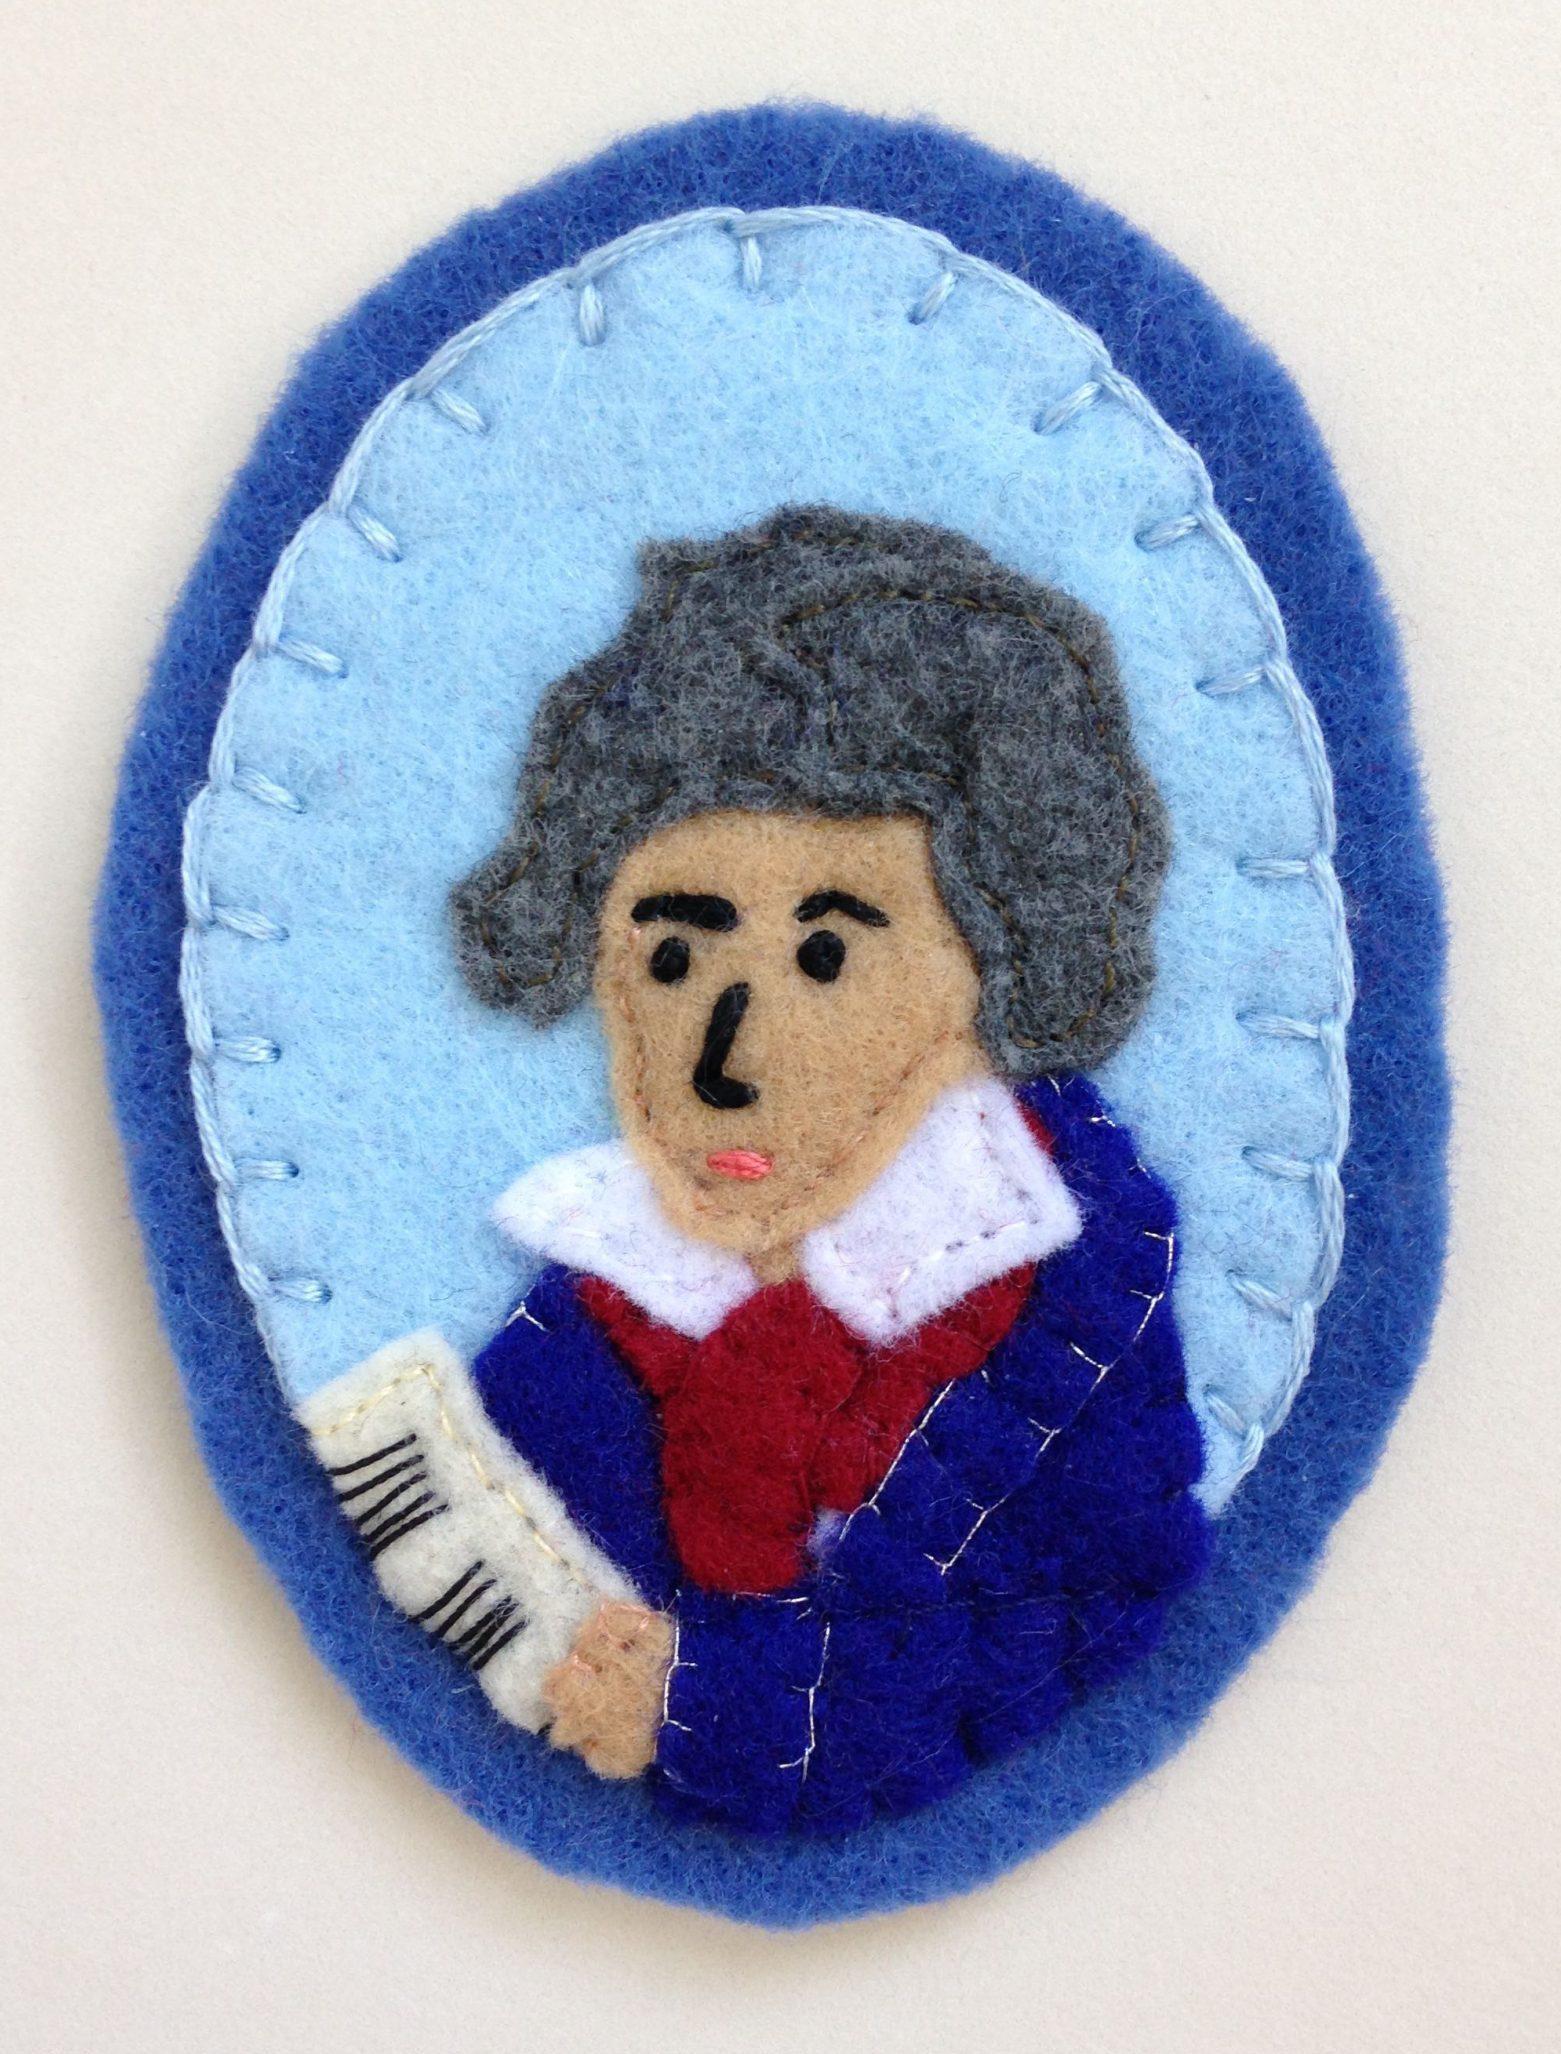 Ludwig van Beethoven Sew-on Patch